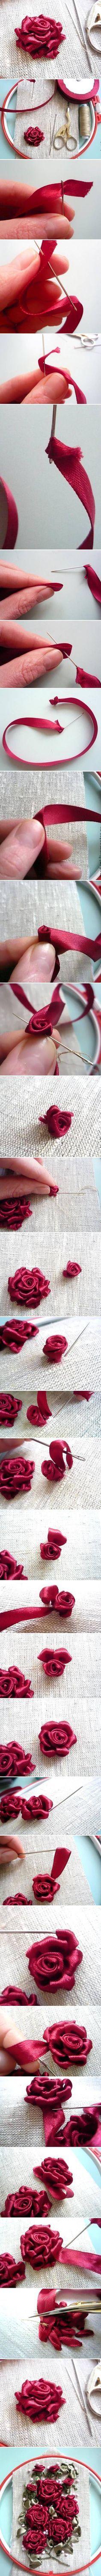 rosas bordadas con cinta de raso. Tutorial